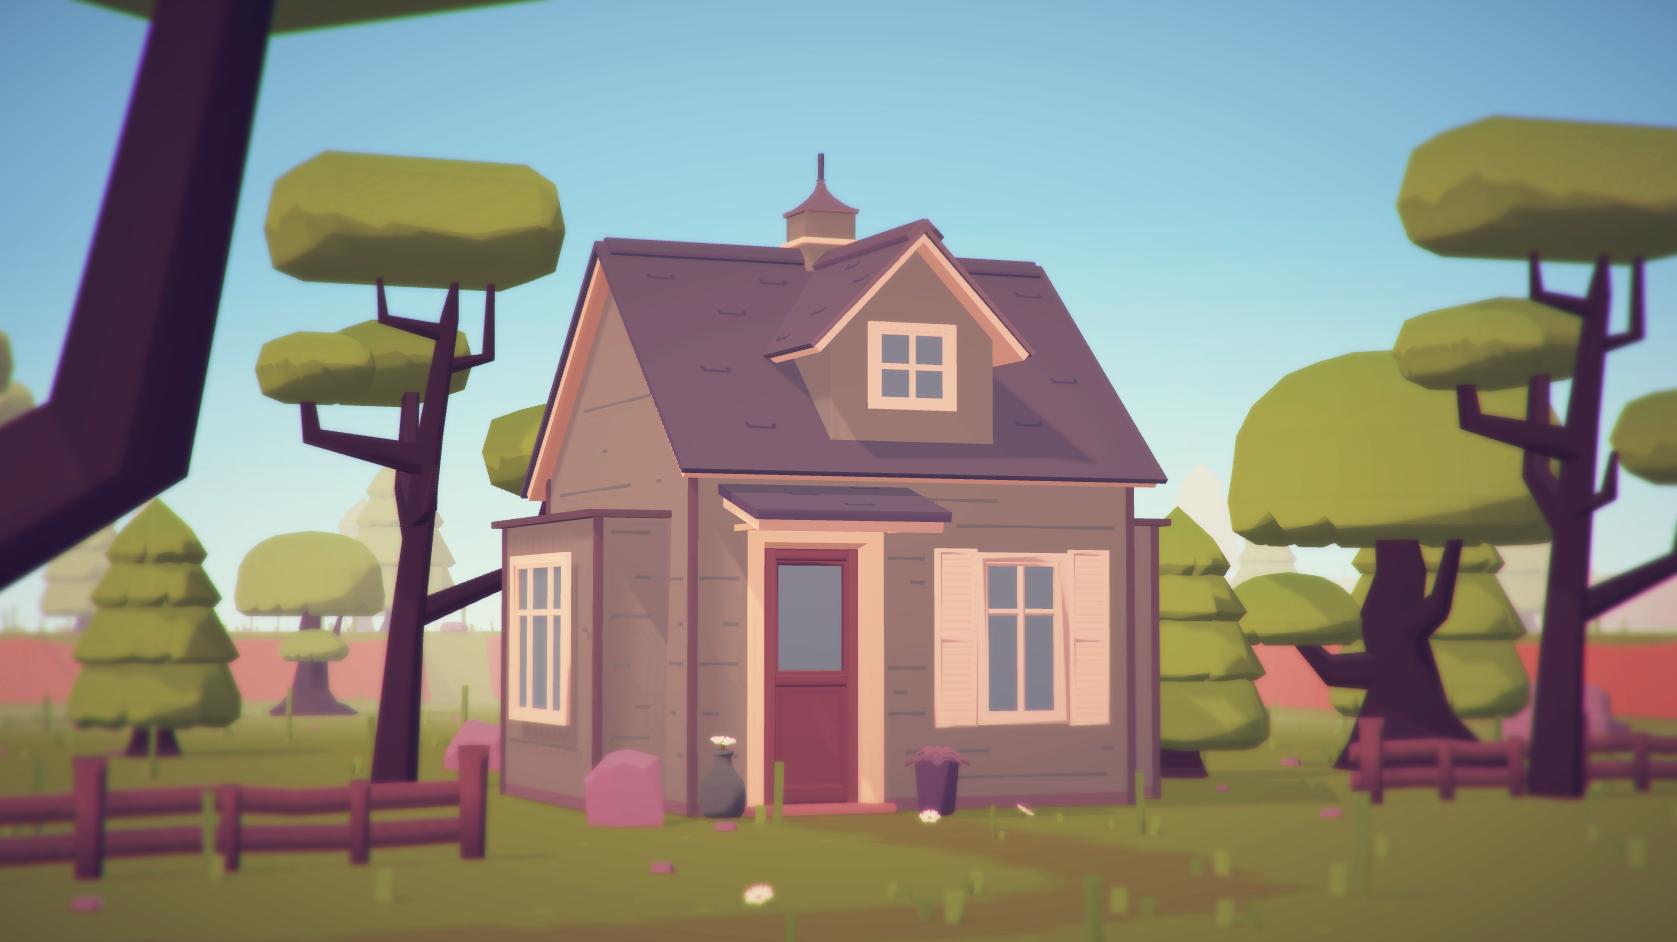 Boring house